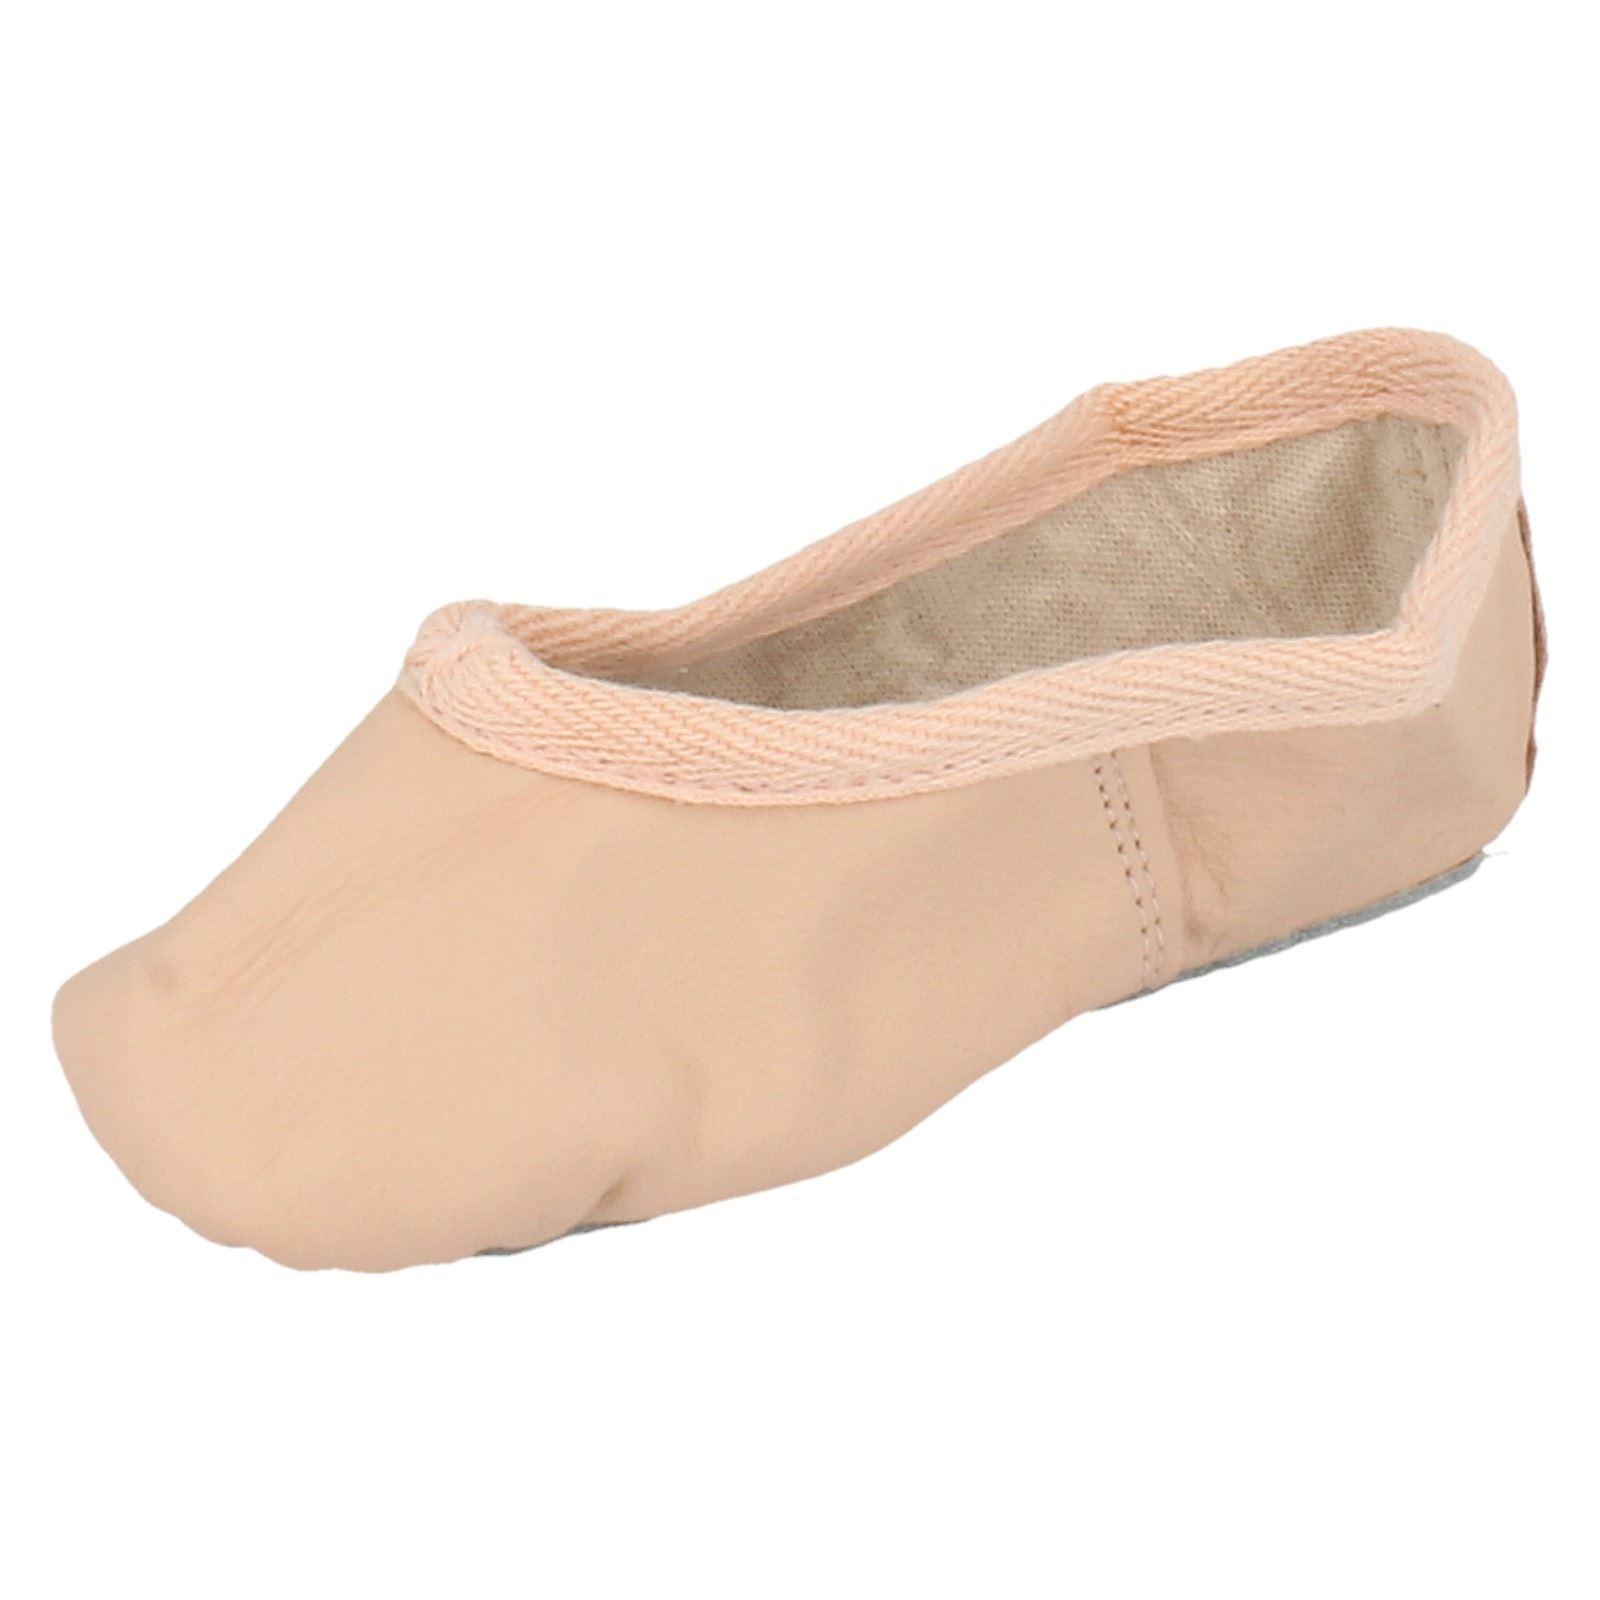 Ballet Zapatos De Baile Para Niños Cuero Gandolfi Zapatos De Ballet-D